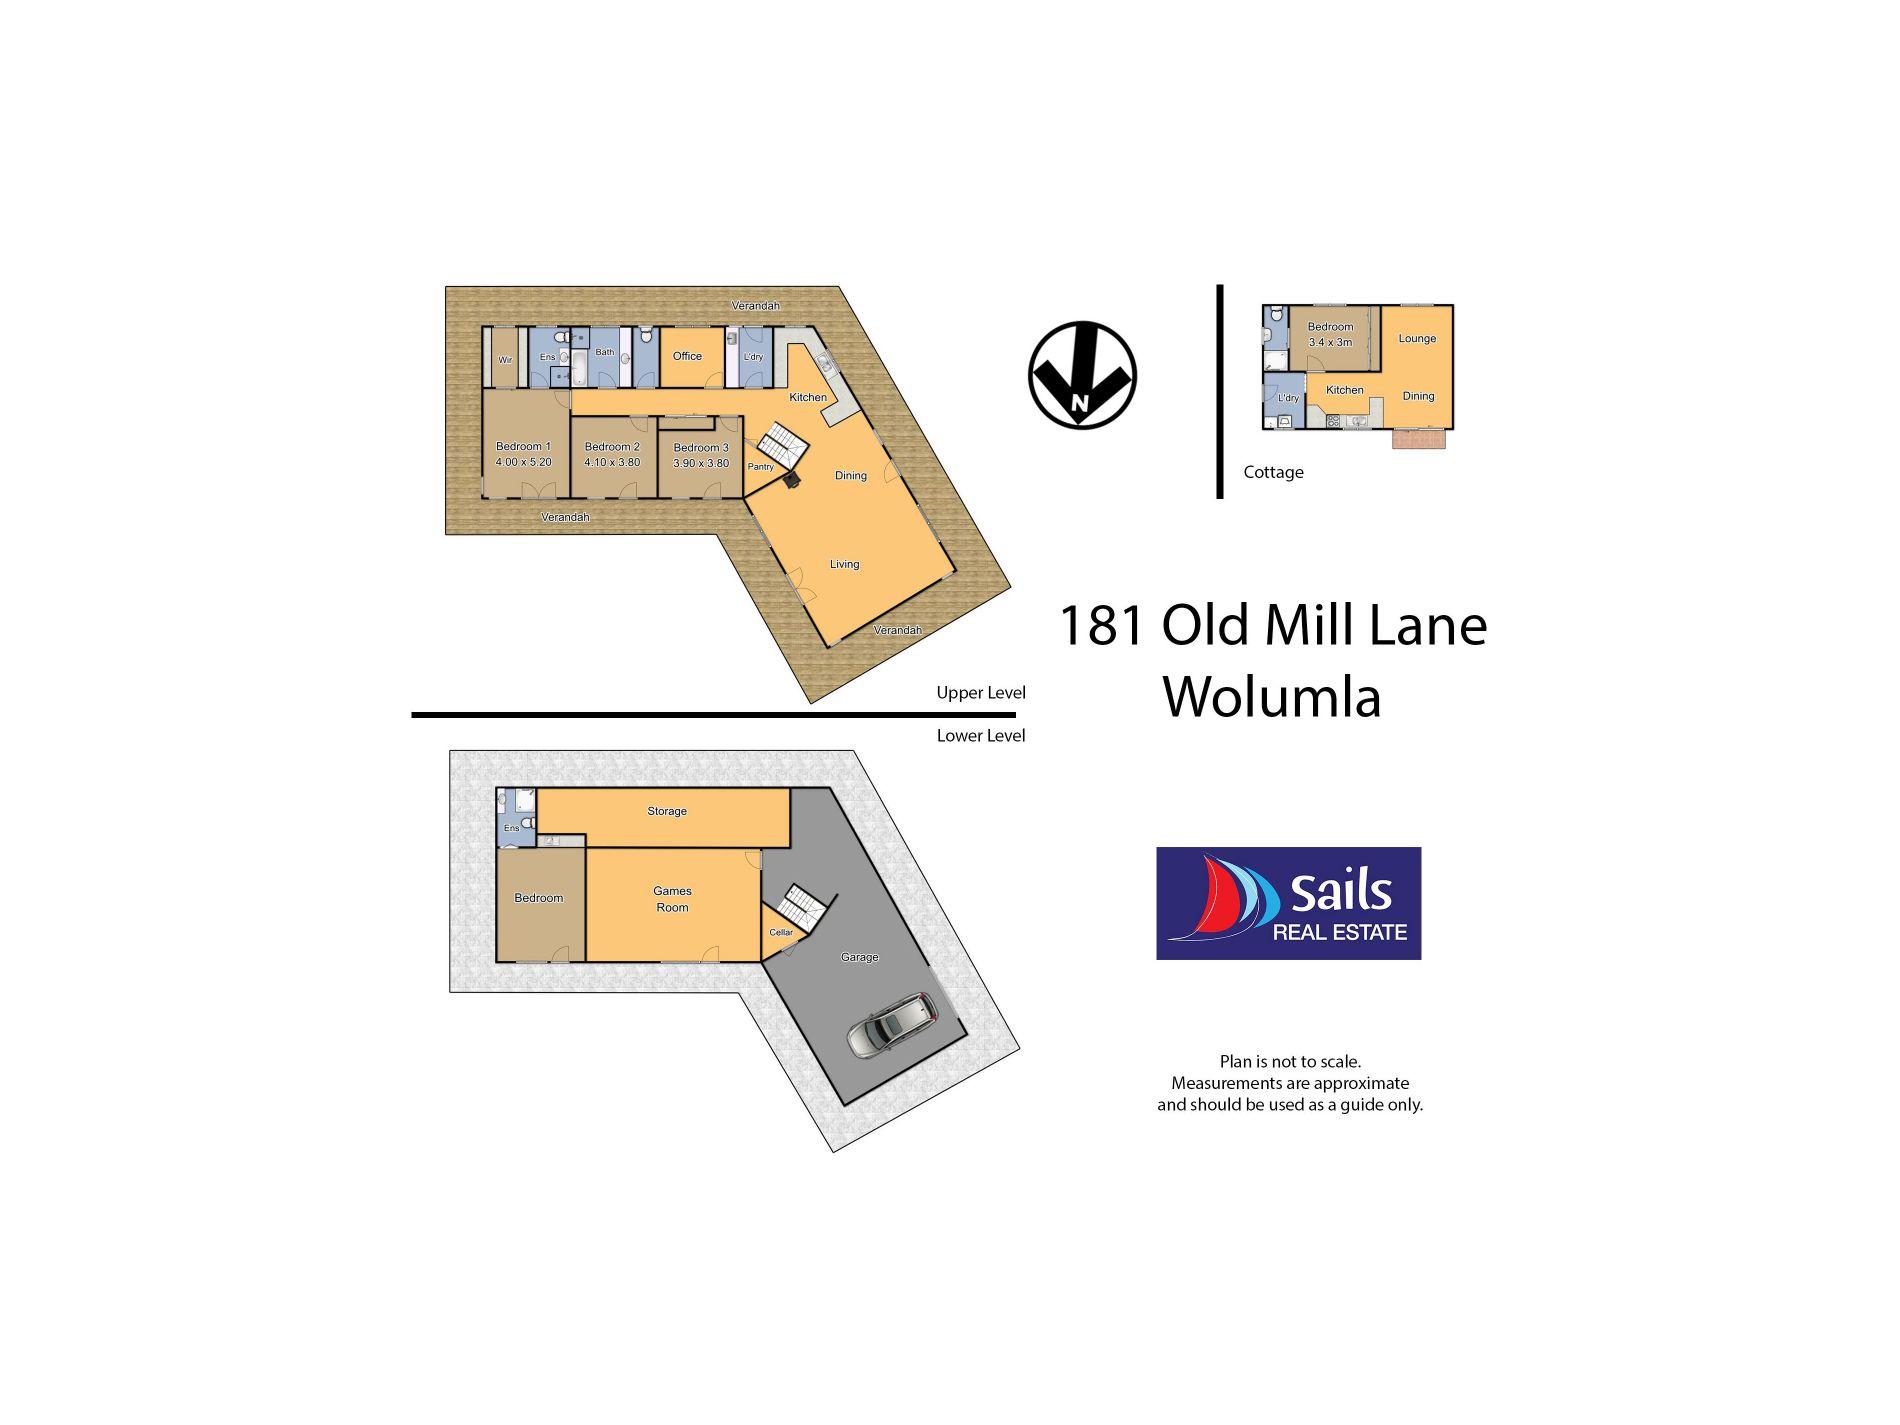 181 Old Mill Lane, Wolumla